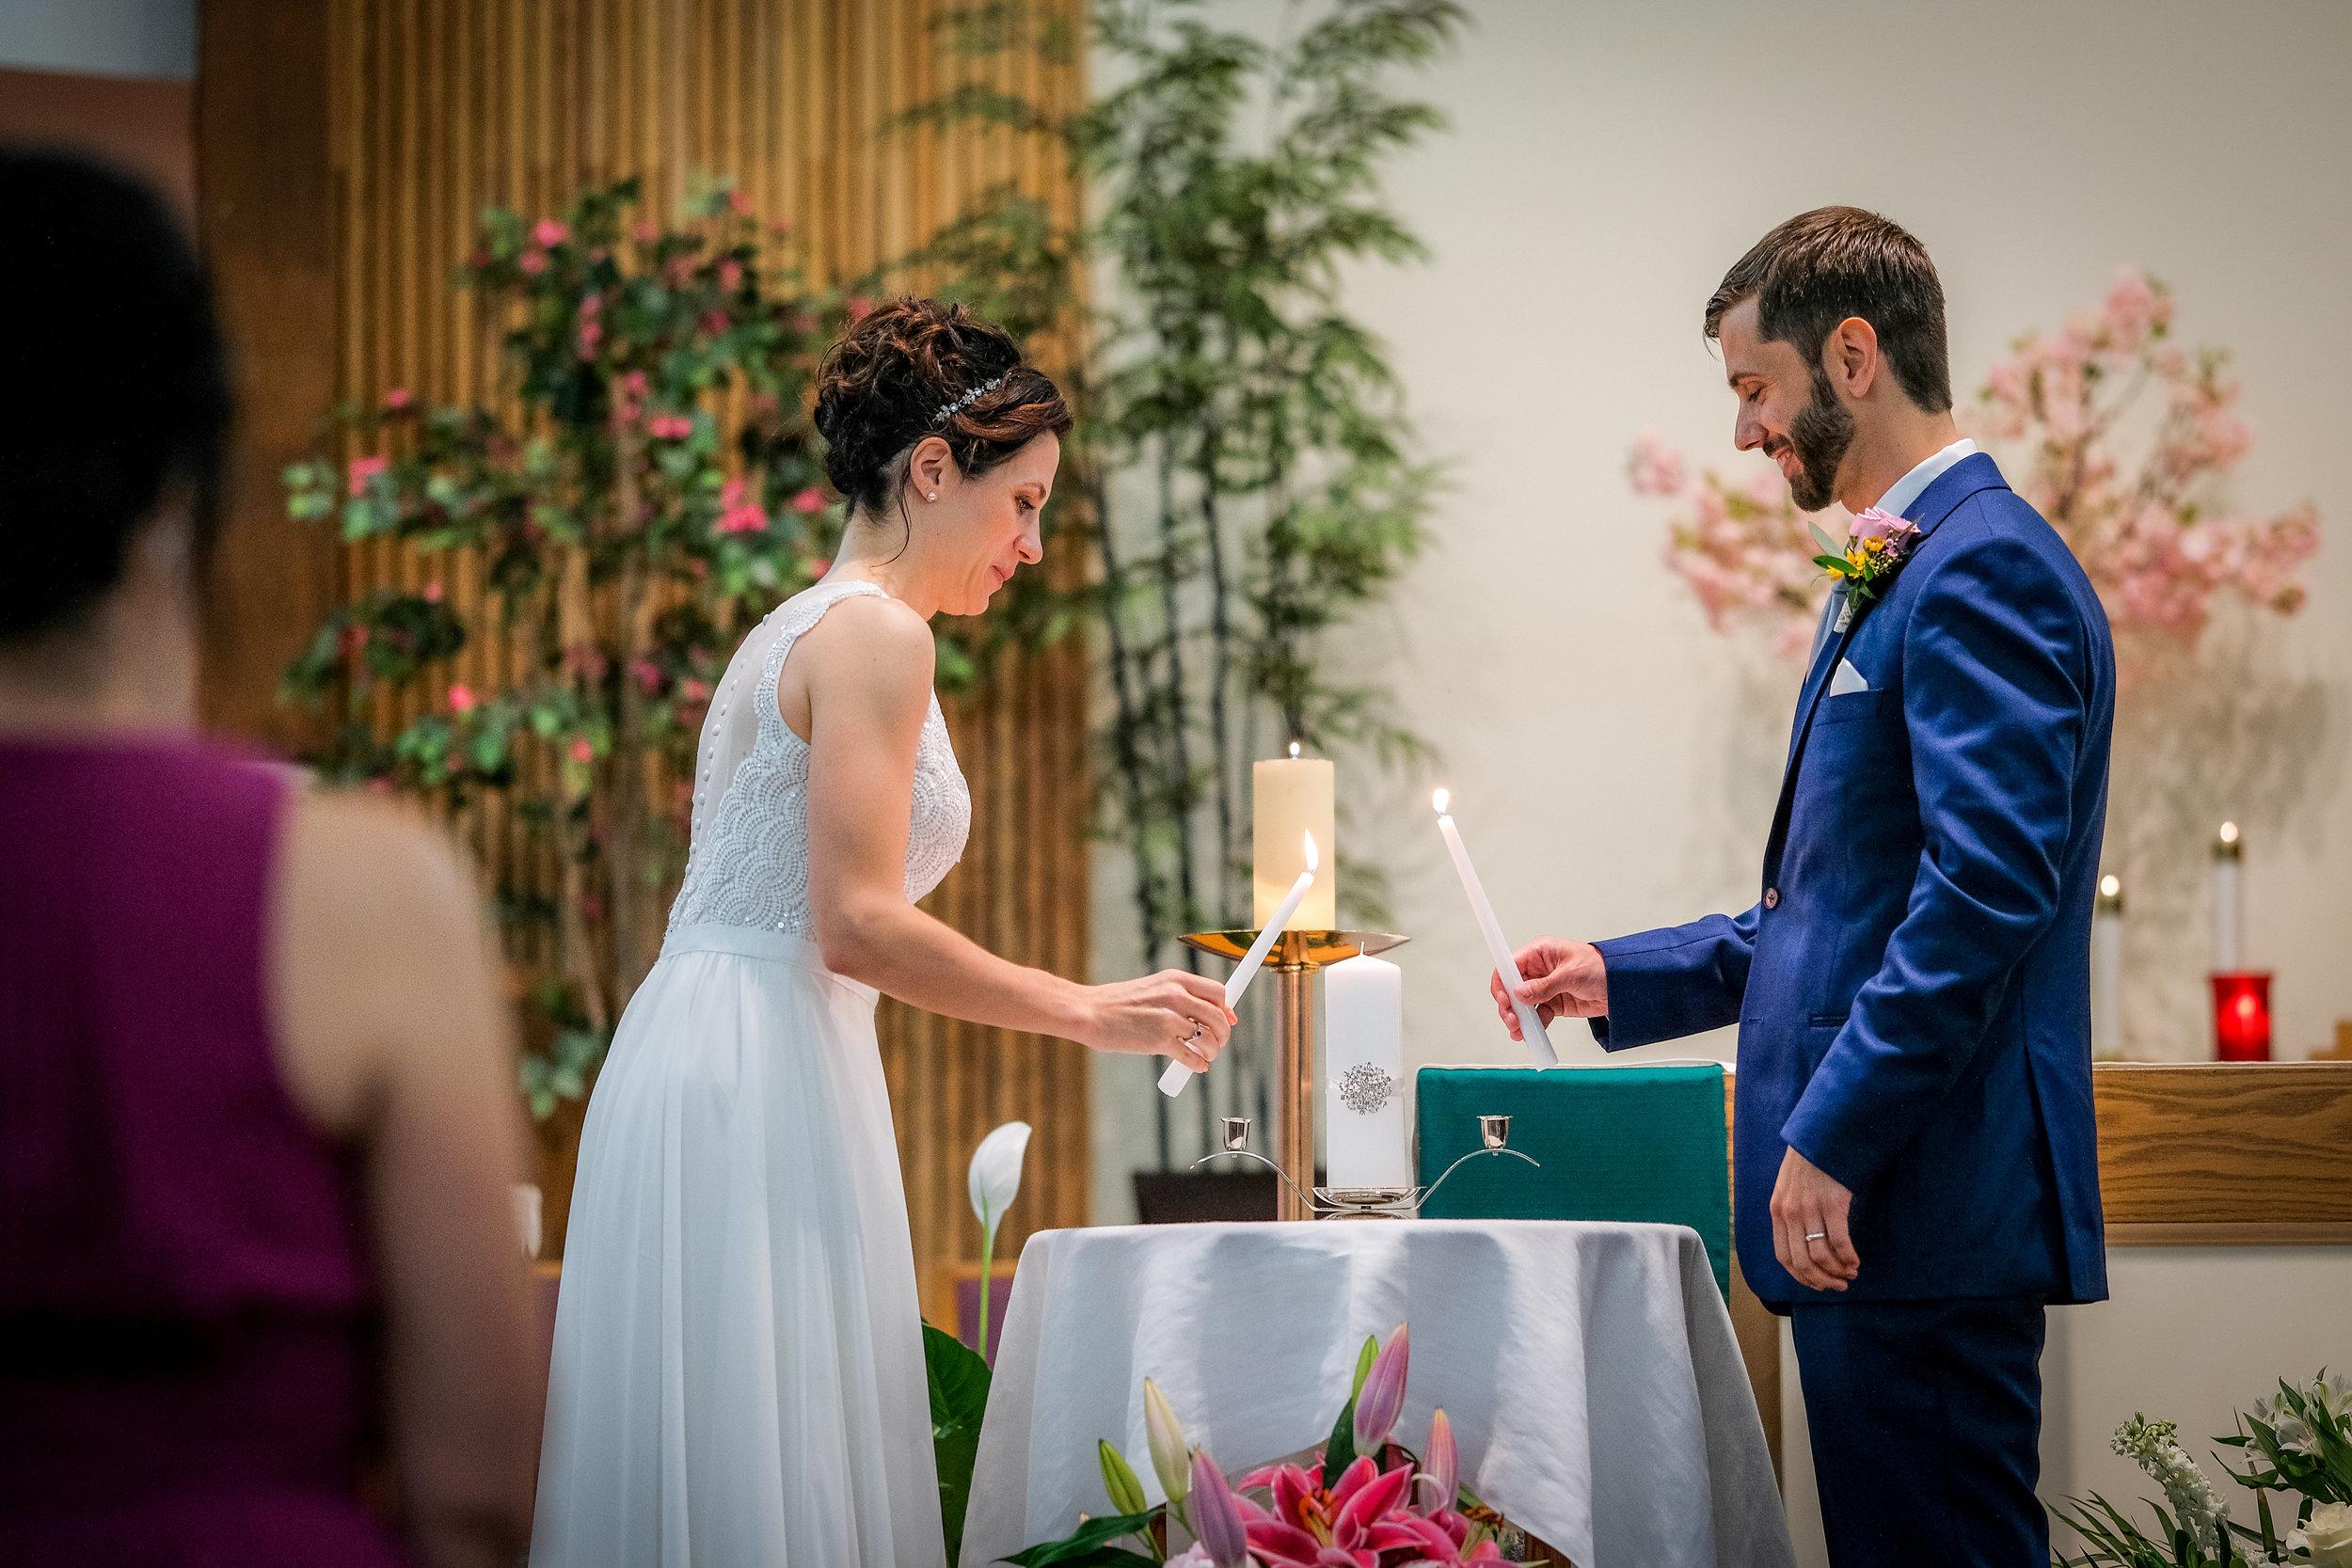 Peabody-Smith-Barn-Wedding-Photography-11.jpg